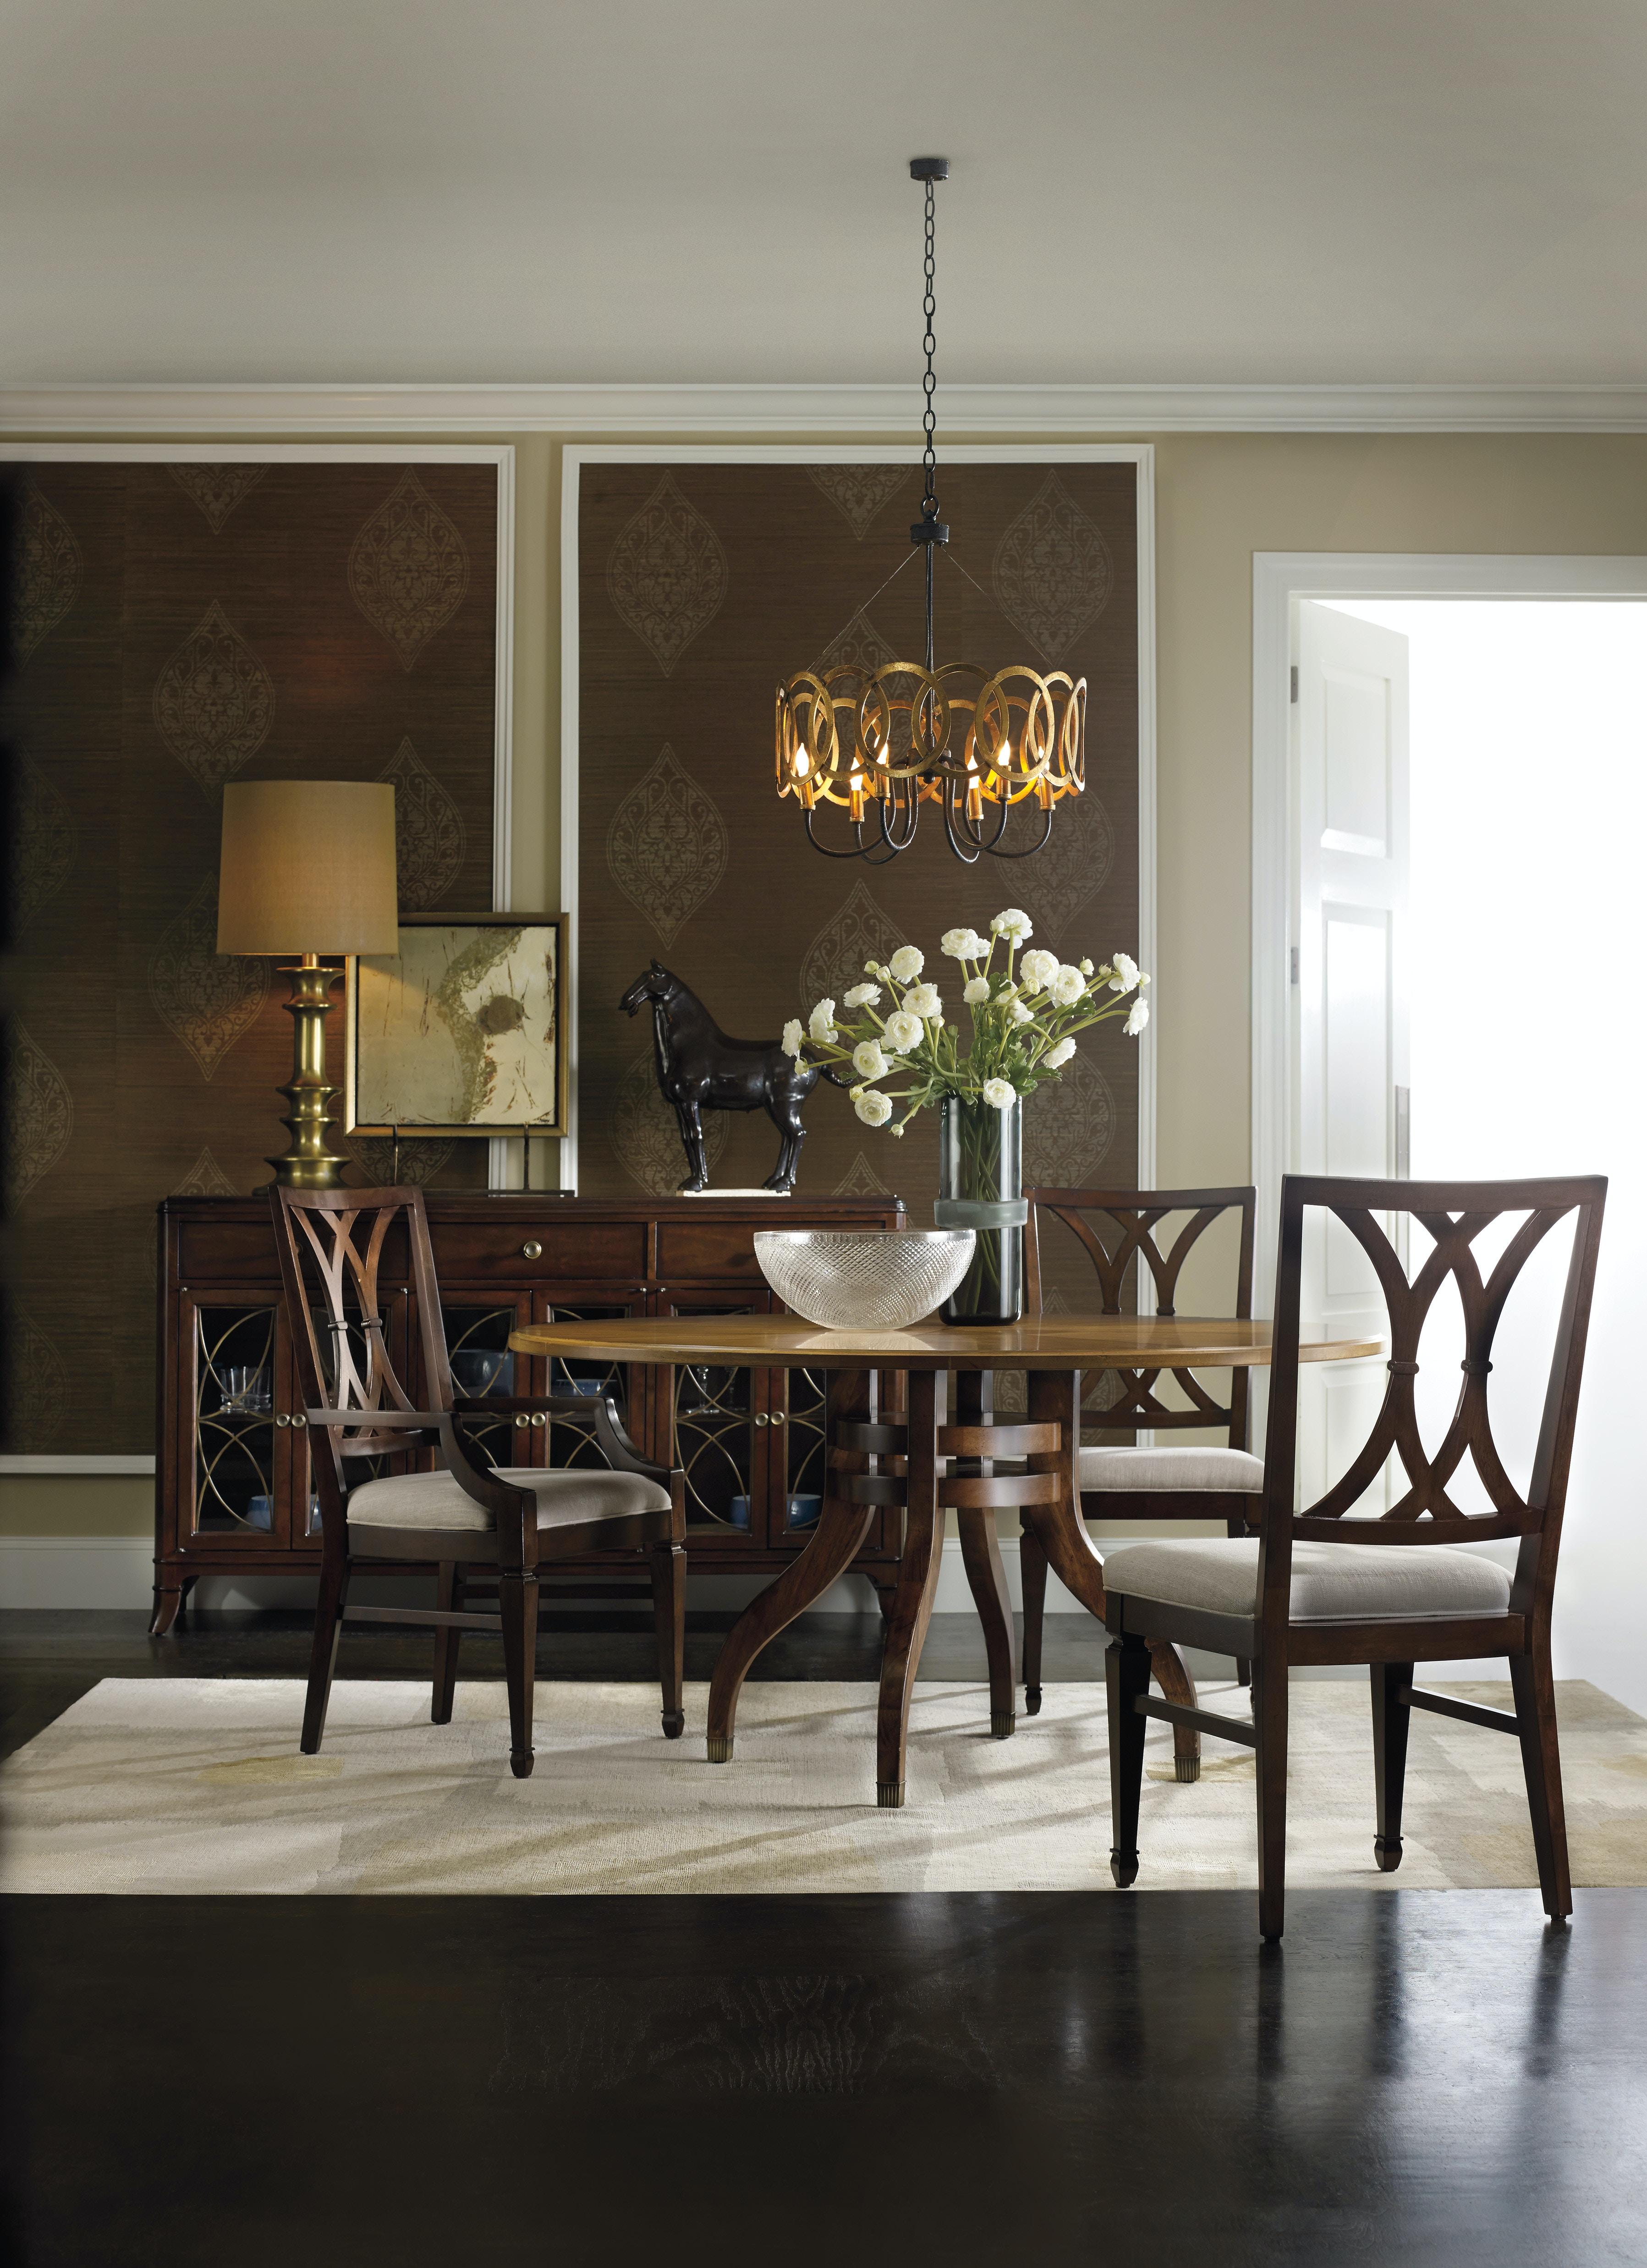 Hooker Furniture Dining Room Palisade Splat Back Arm Chair 5183-75300